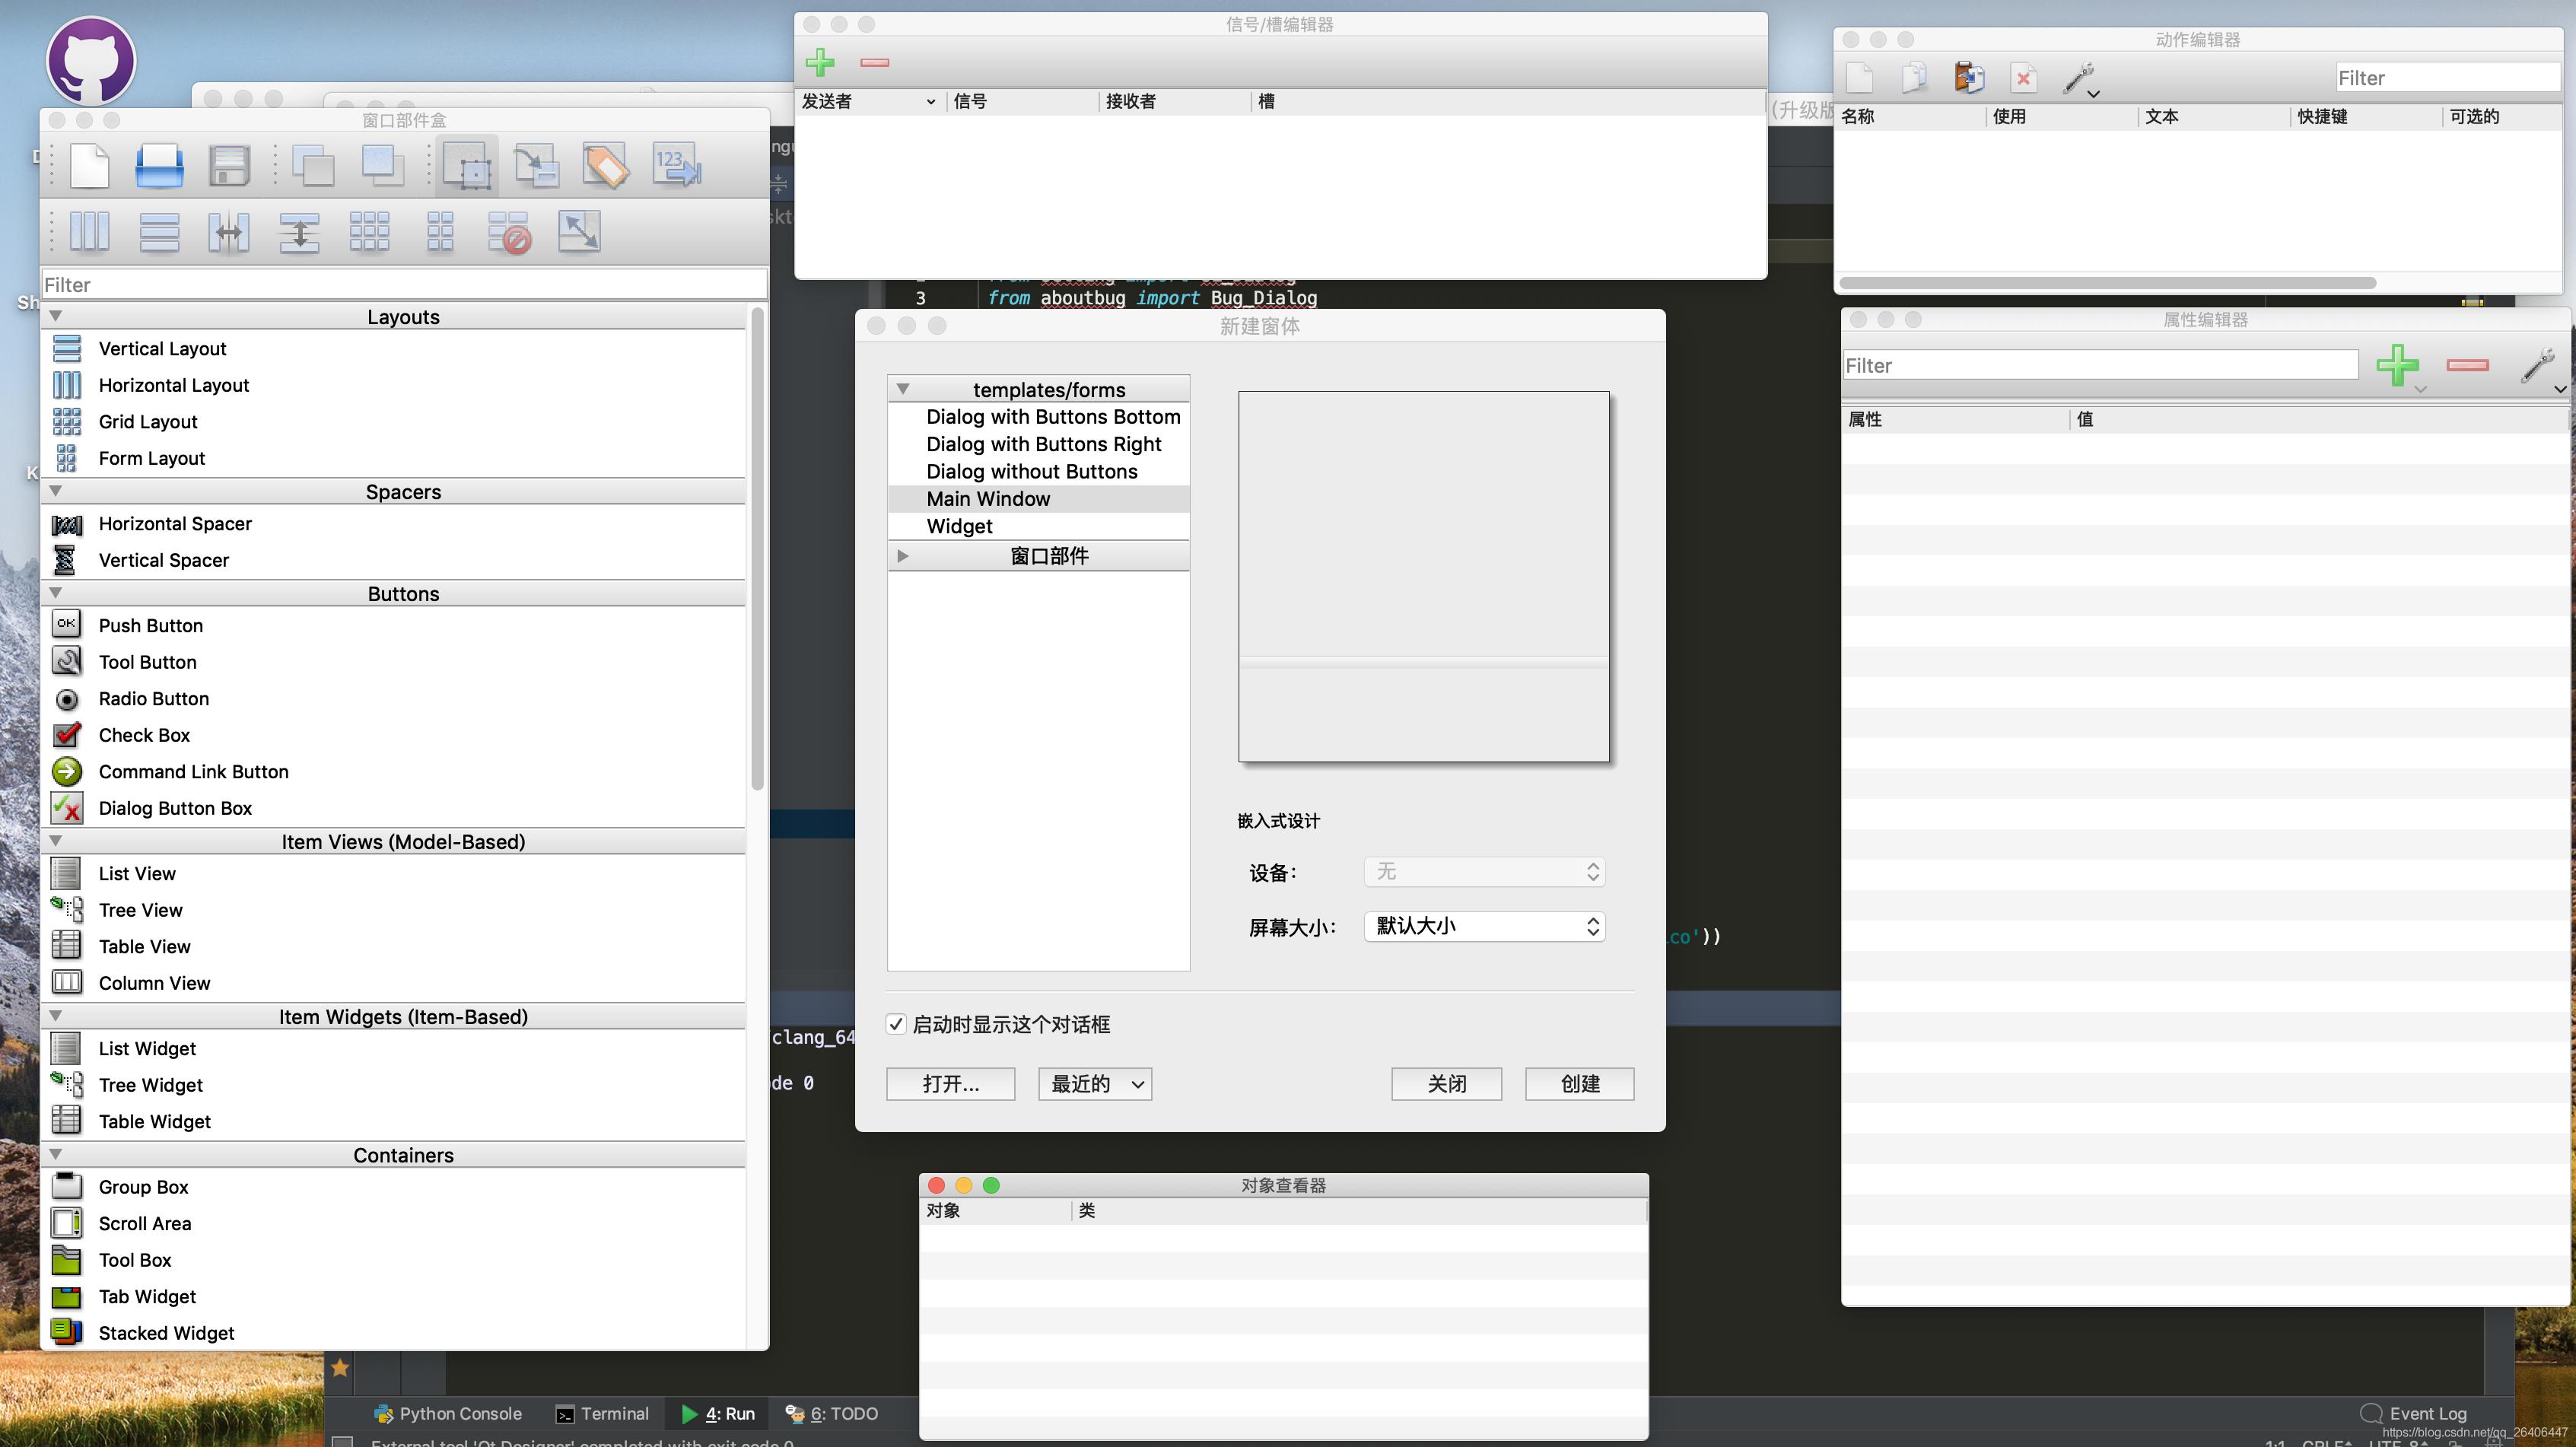 pyqt(一)pyqt环境搭建win+mac(pycharm+designer) - kid的博客